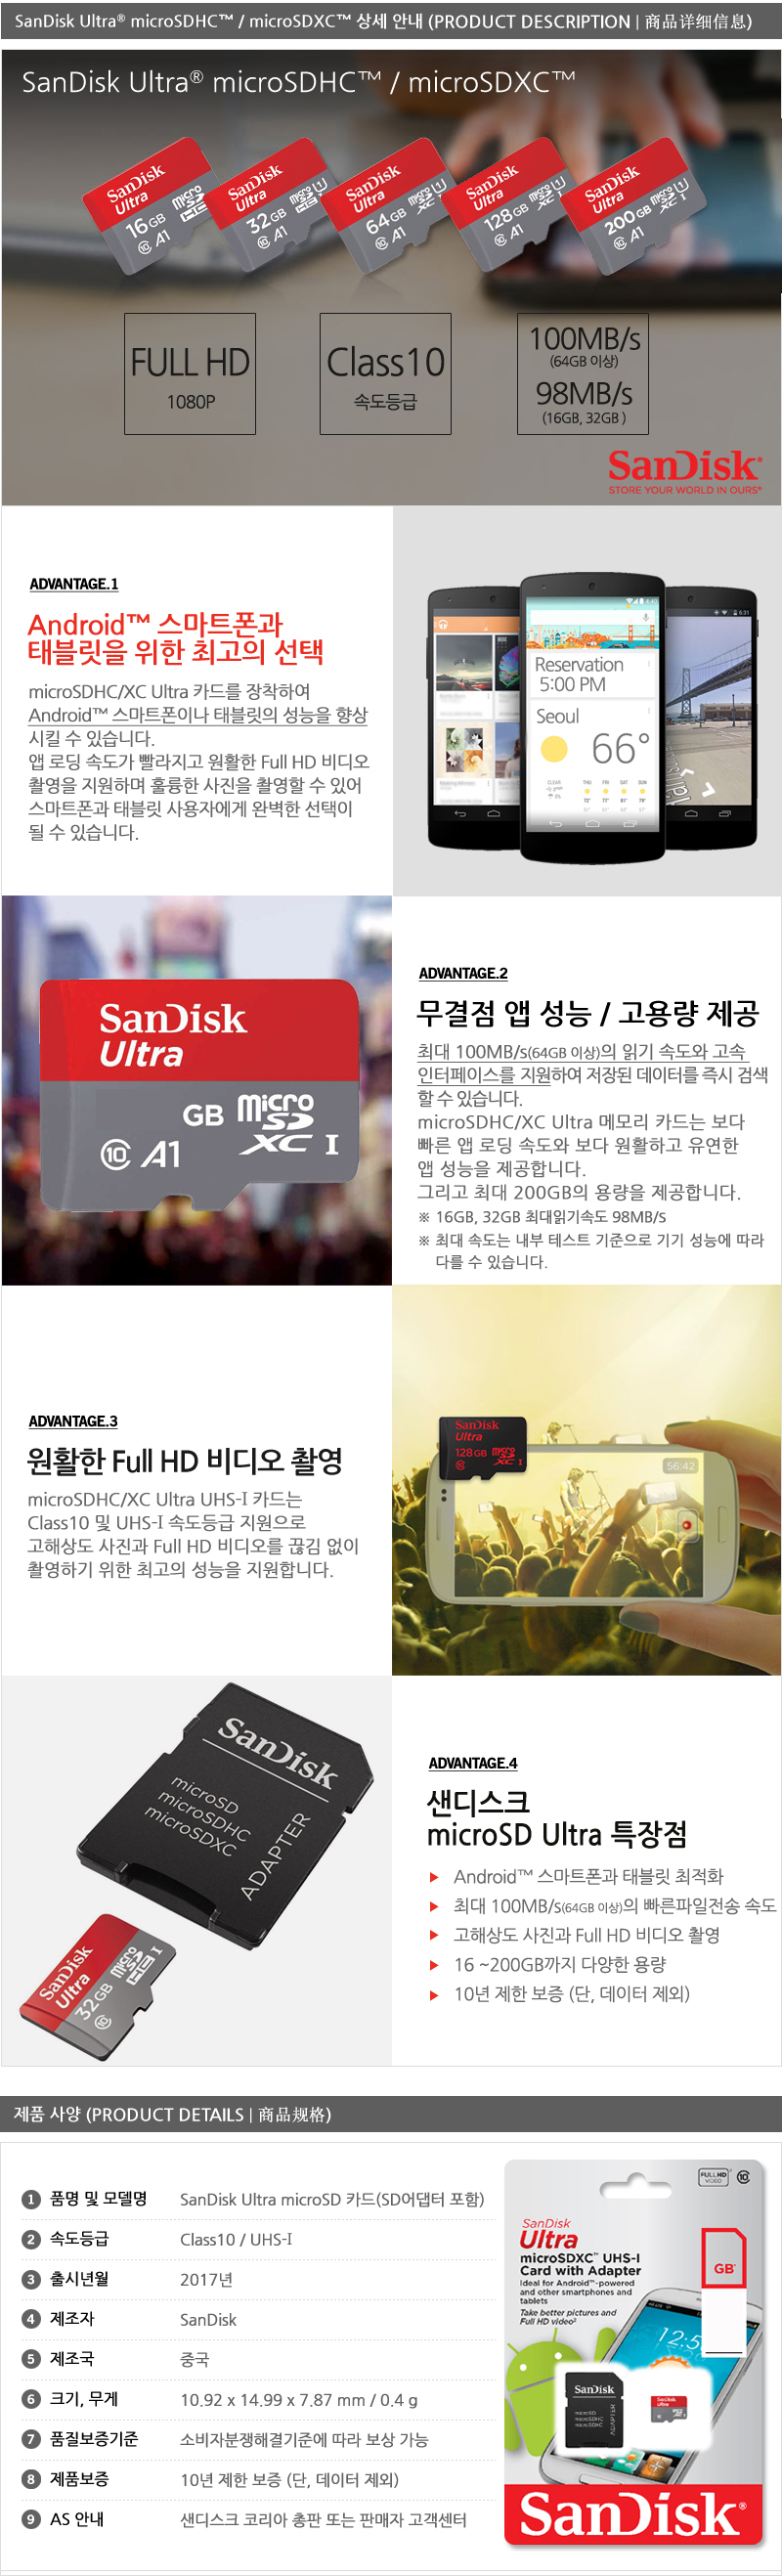 Android 스마트폰과 태블릿을 위한 최고의 선택 무결점 액 성능/고용량 제공 원활한 Full HD비디오 촬영 샌디스크 microSD Ultra특장점